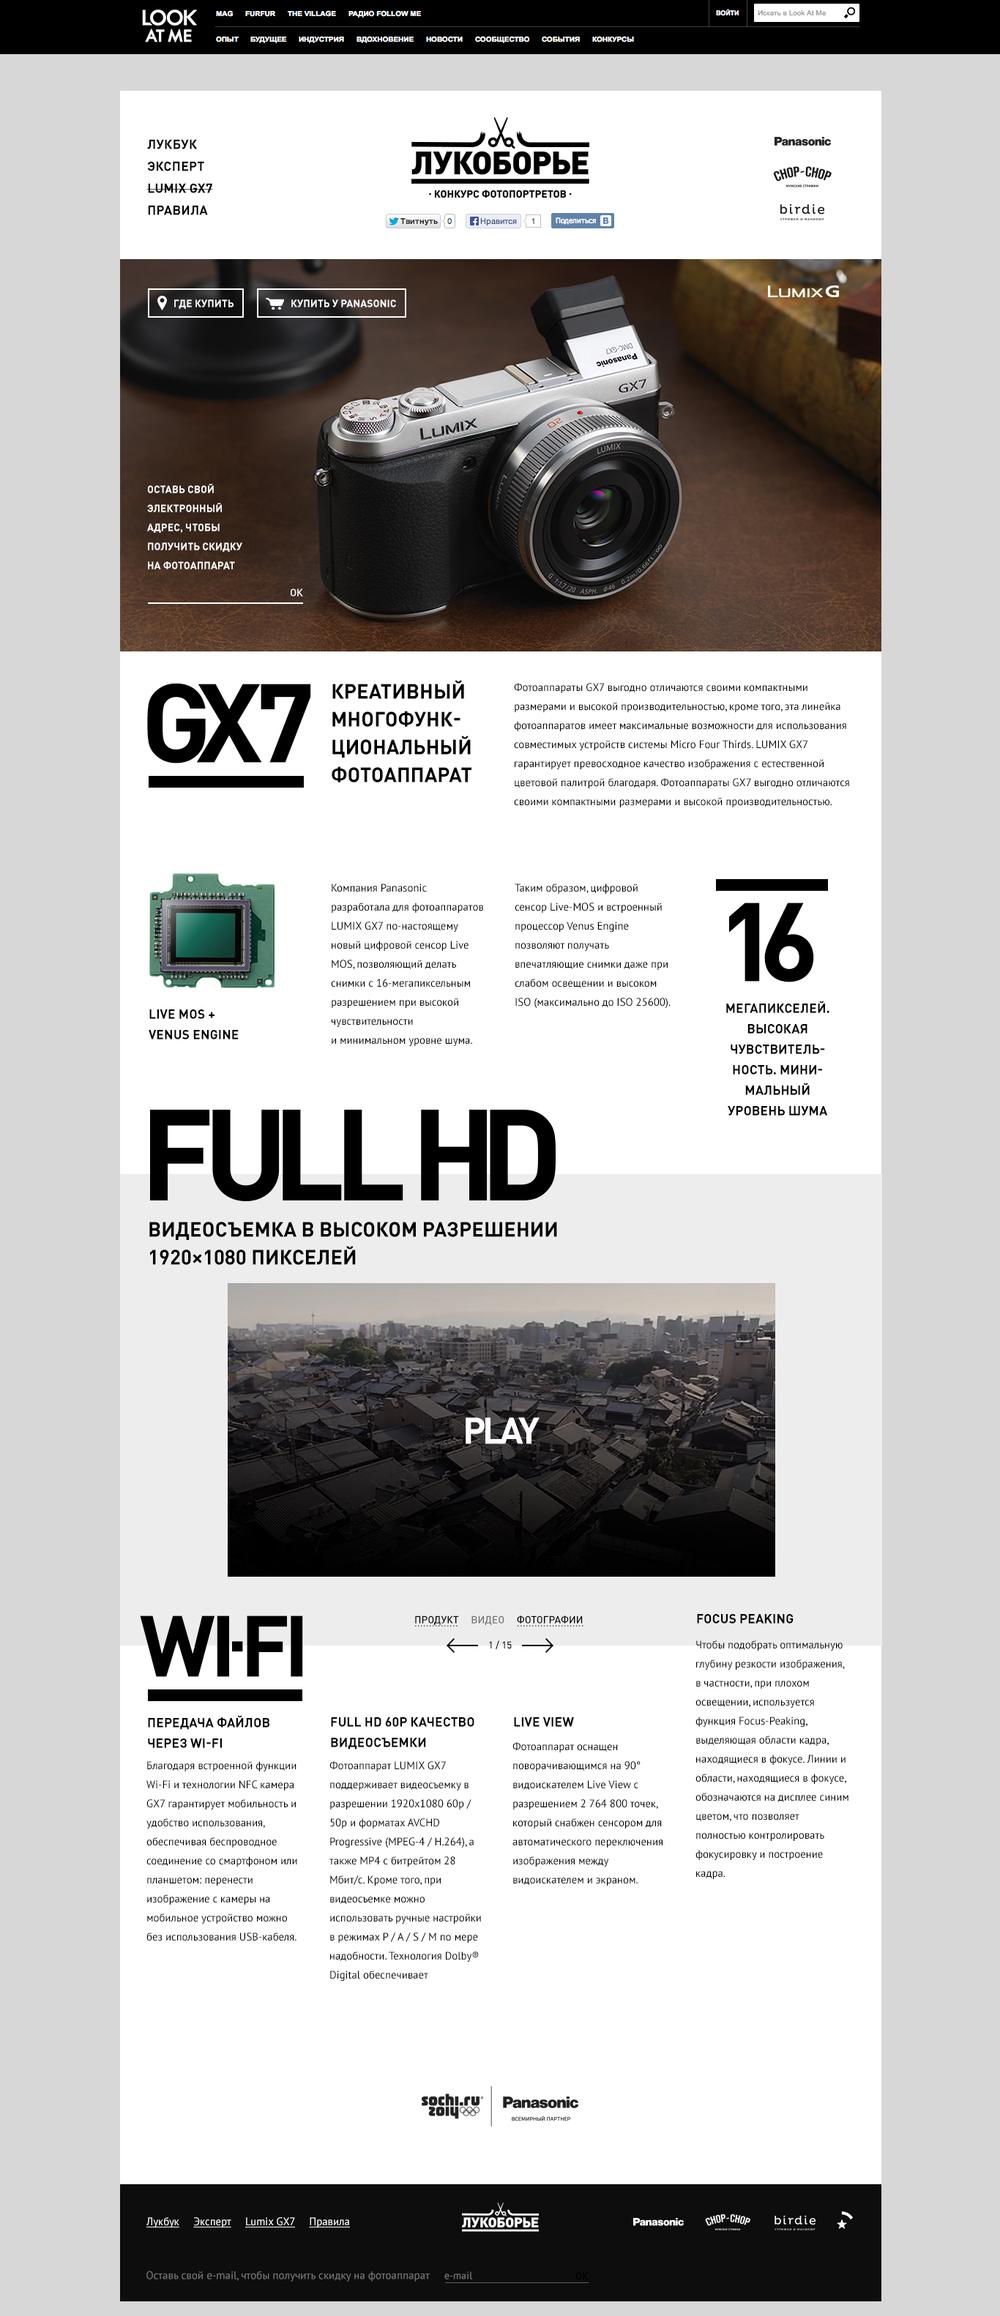 02 Product.jpg